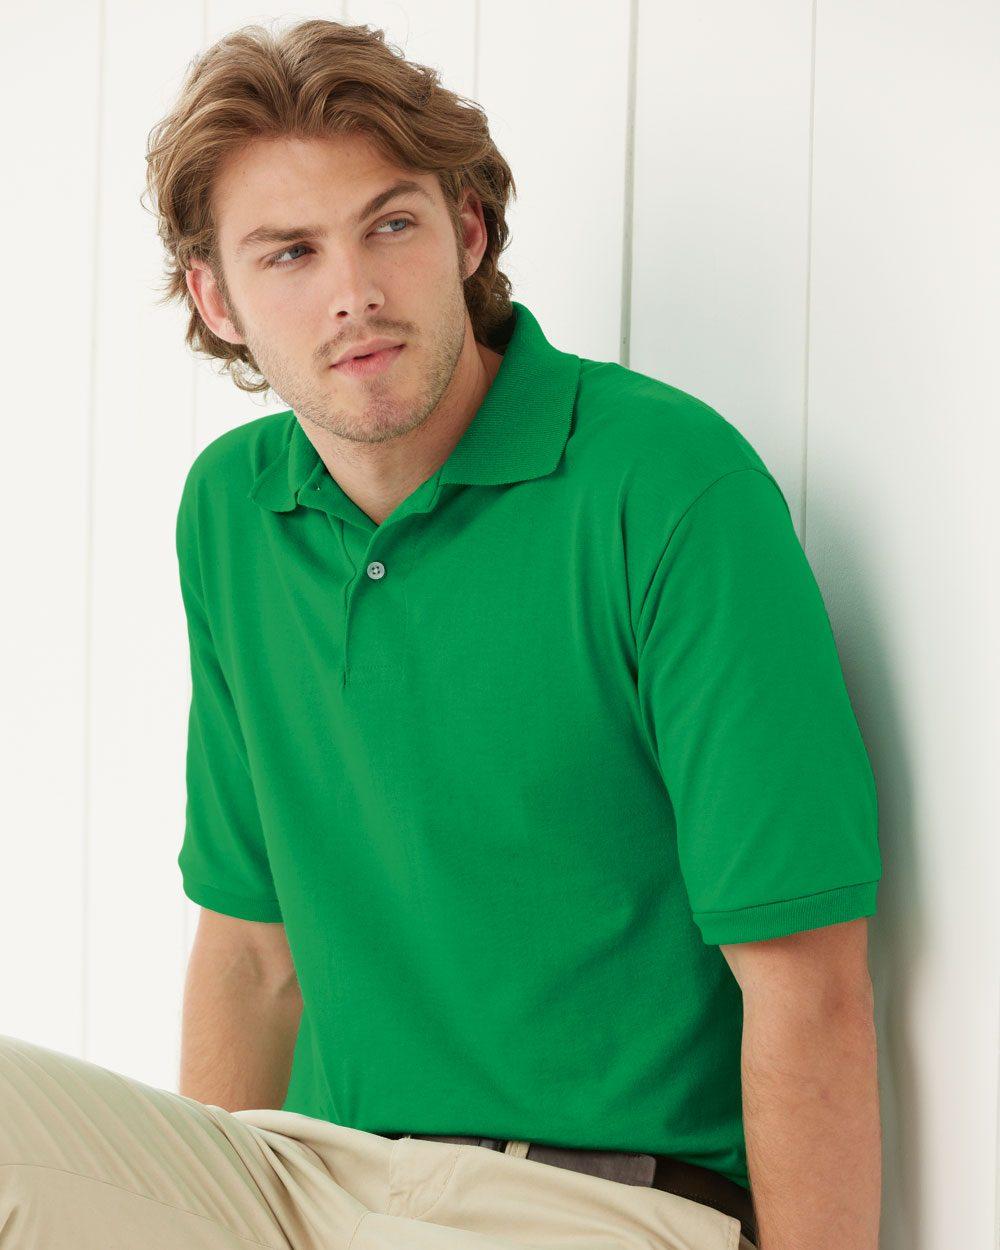 JERZEES 437MSR - SpotShield 50/50 Sport Shirt